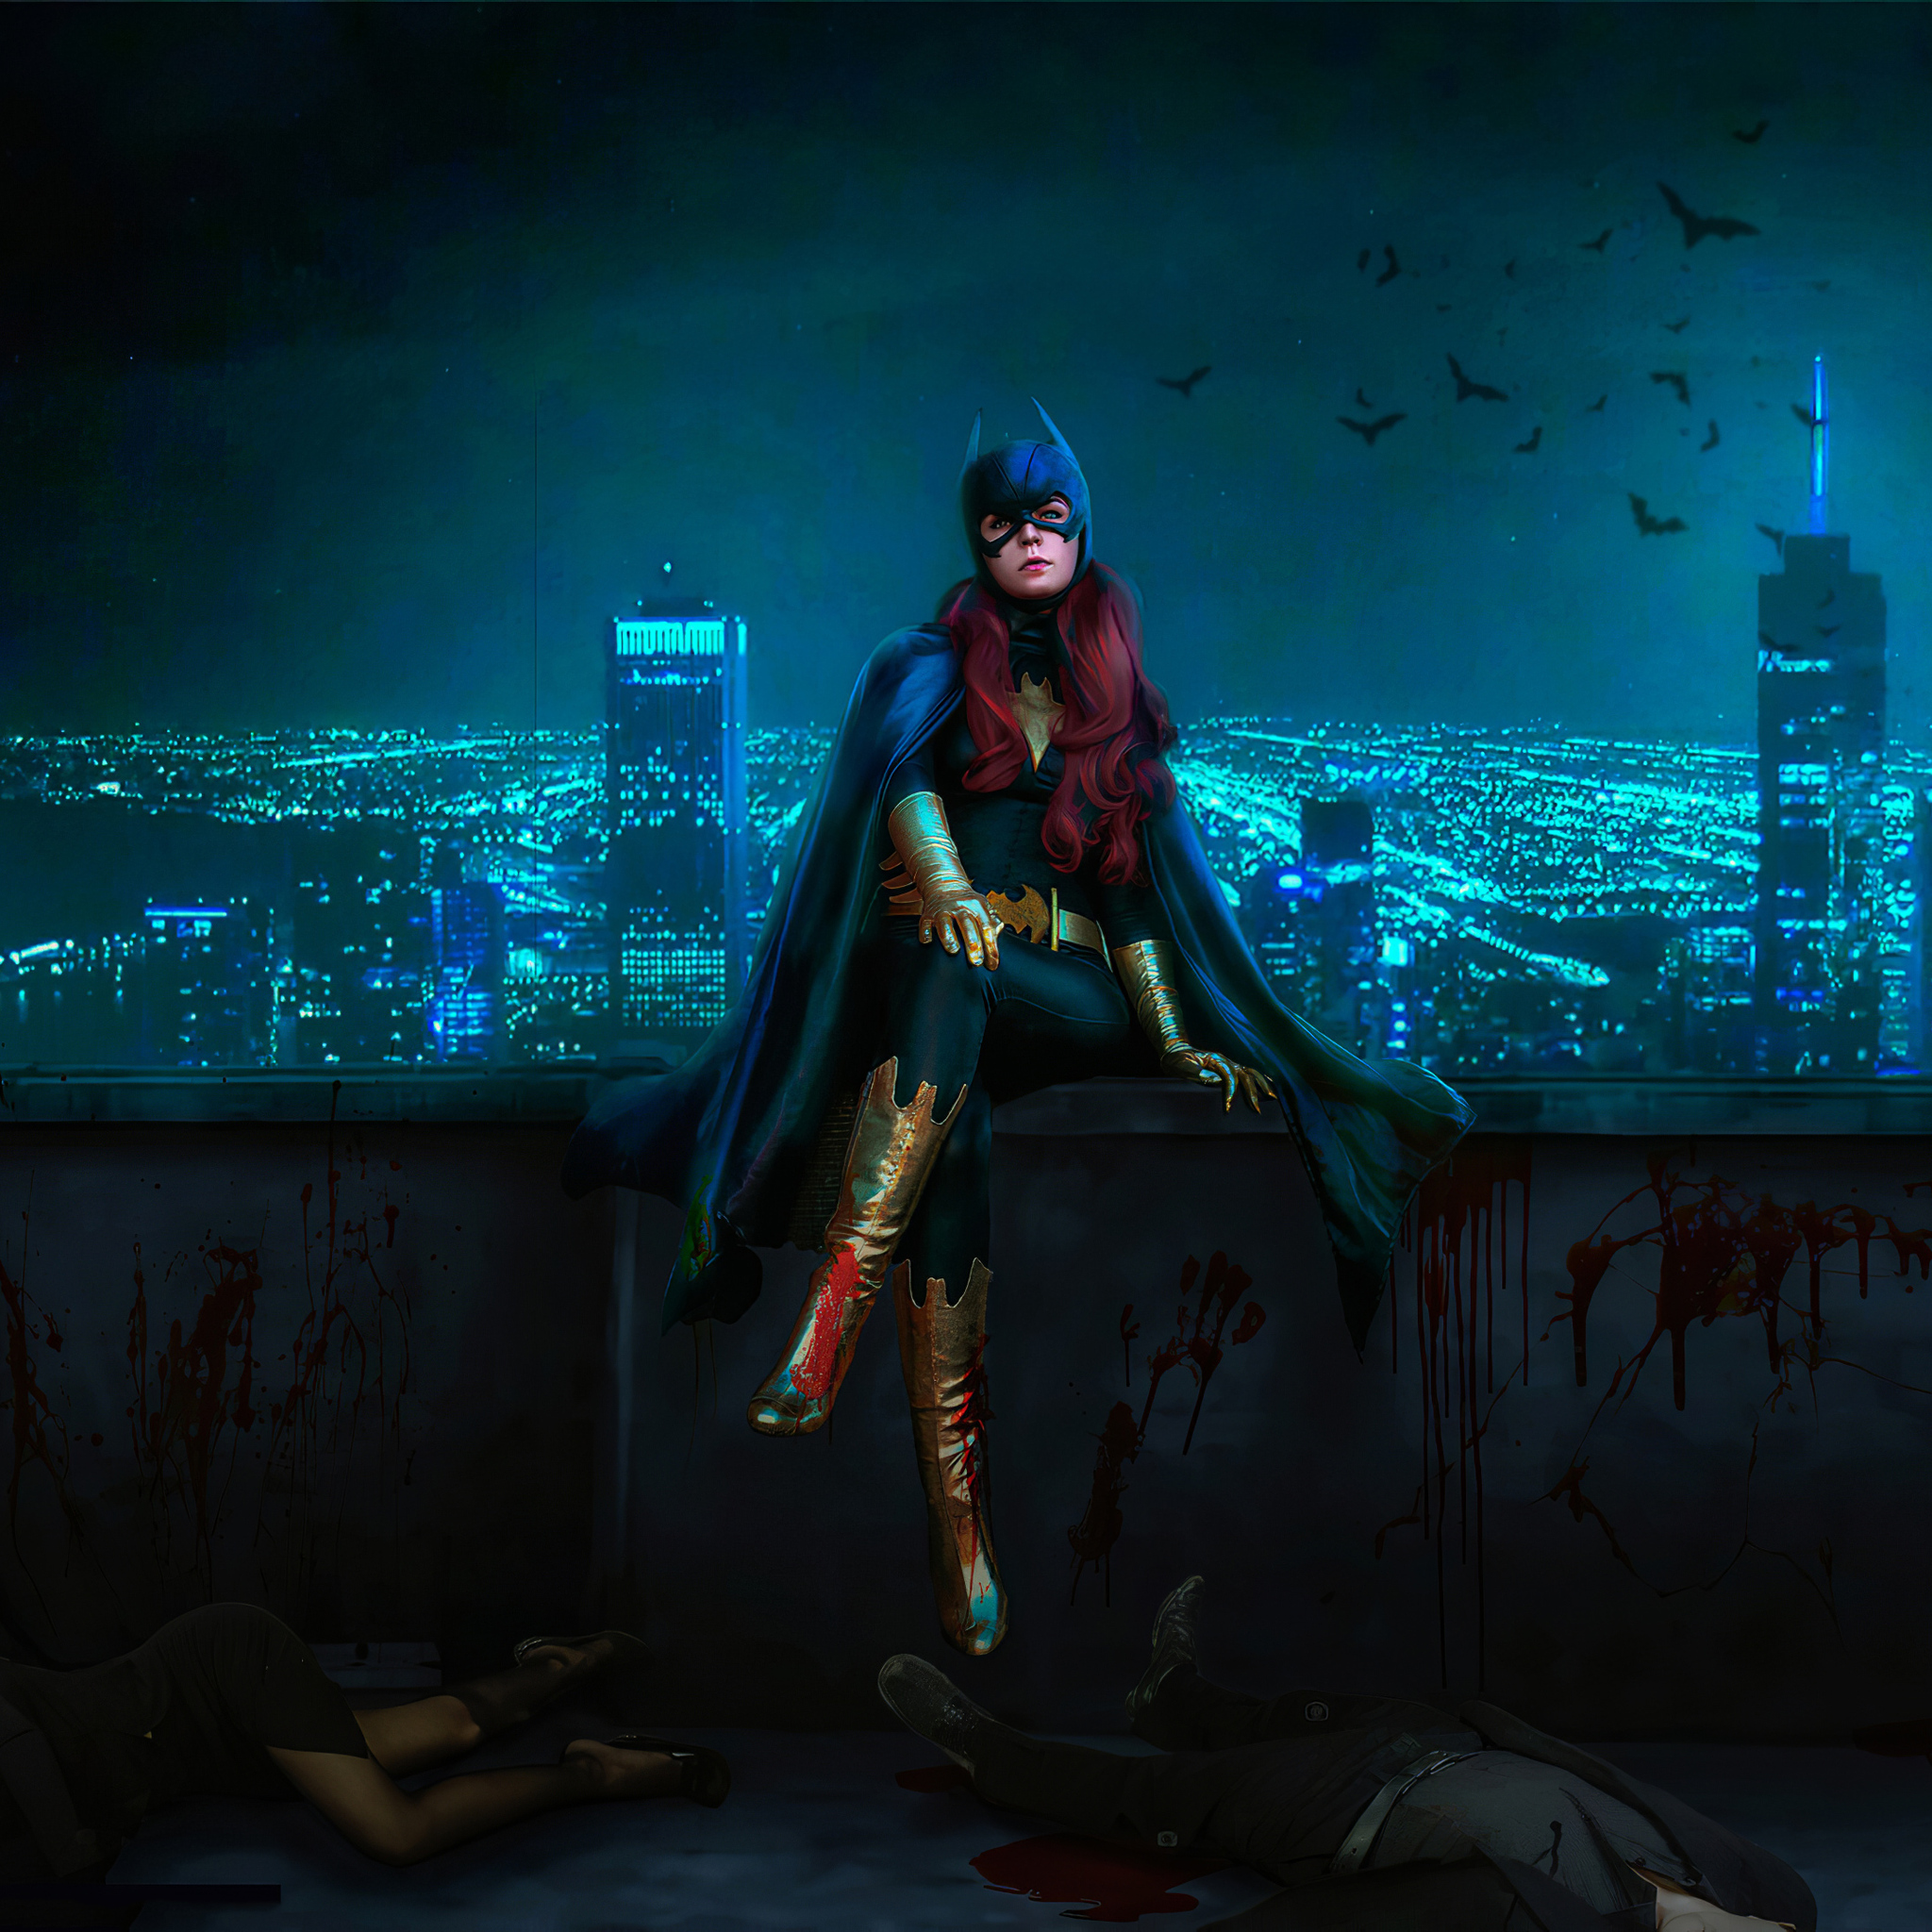 batwoman-2020-cz.jpg